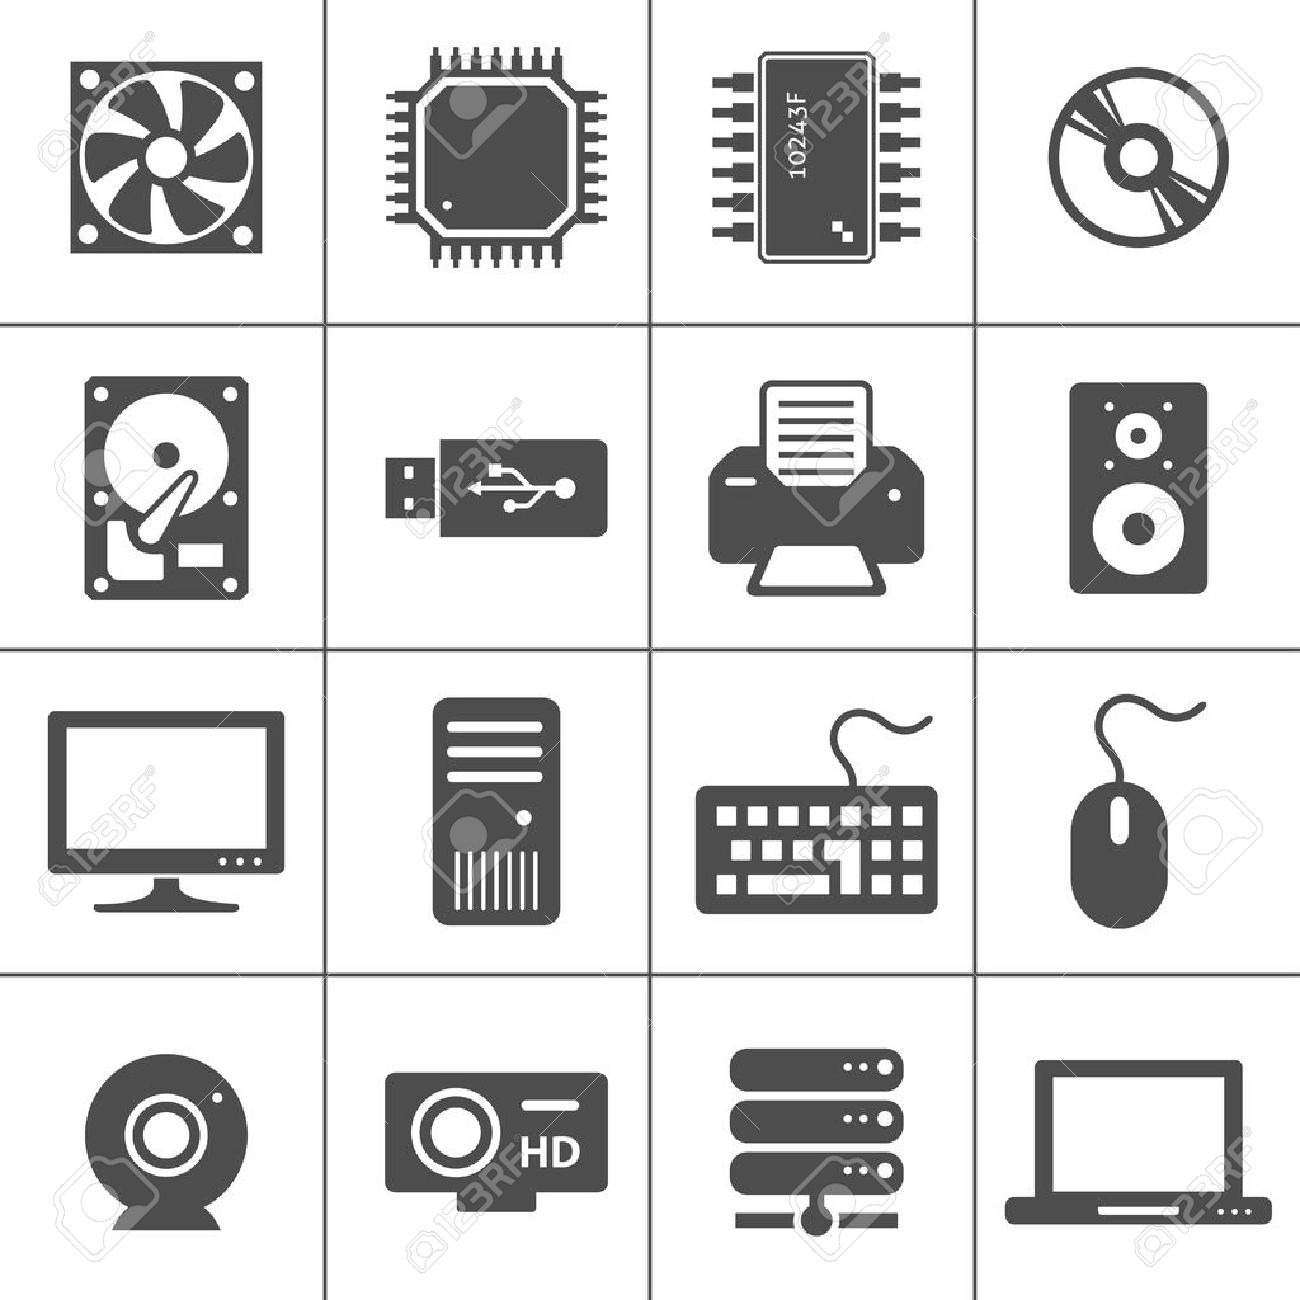 hardware  Computer Hardware  Hardware